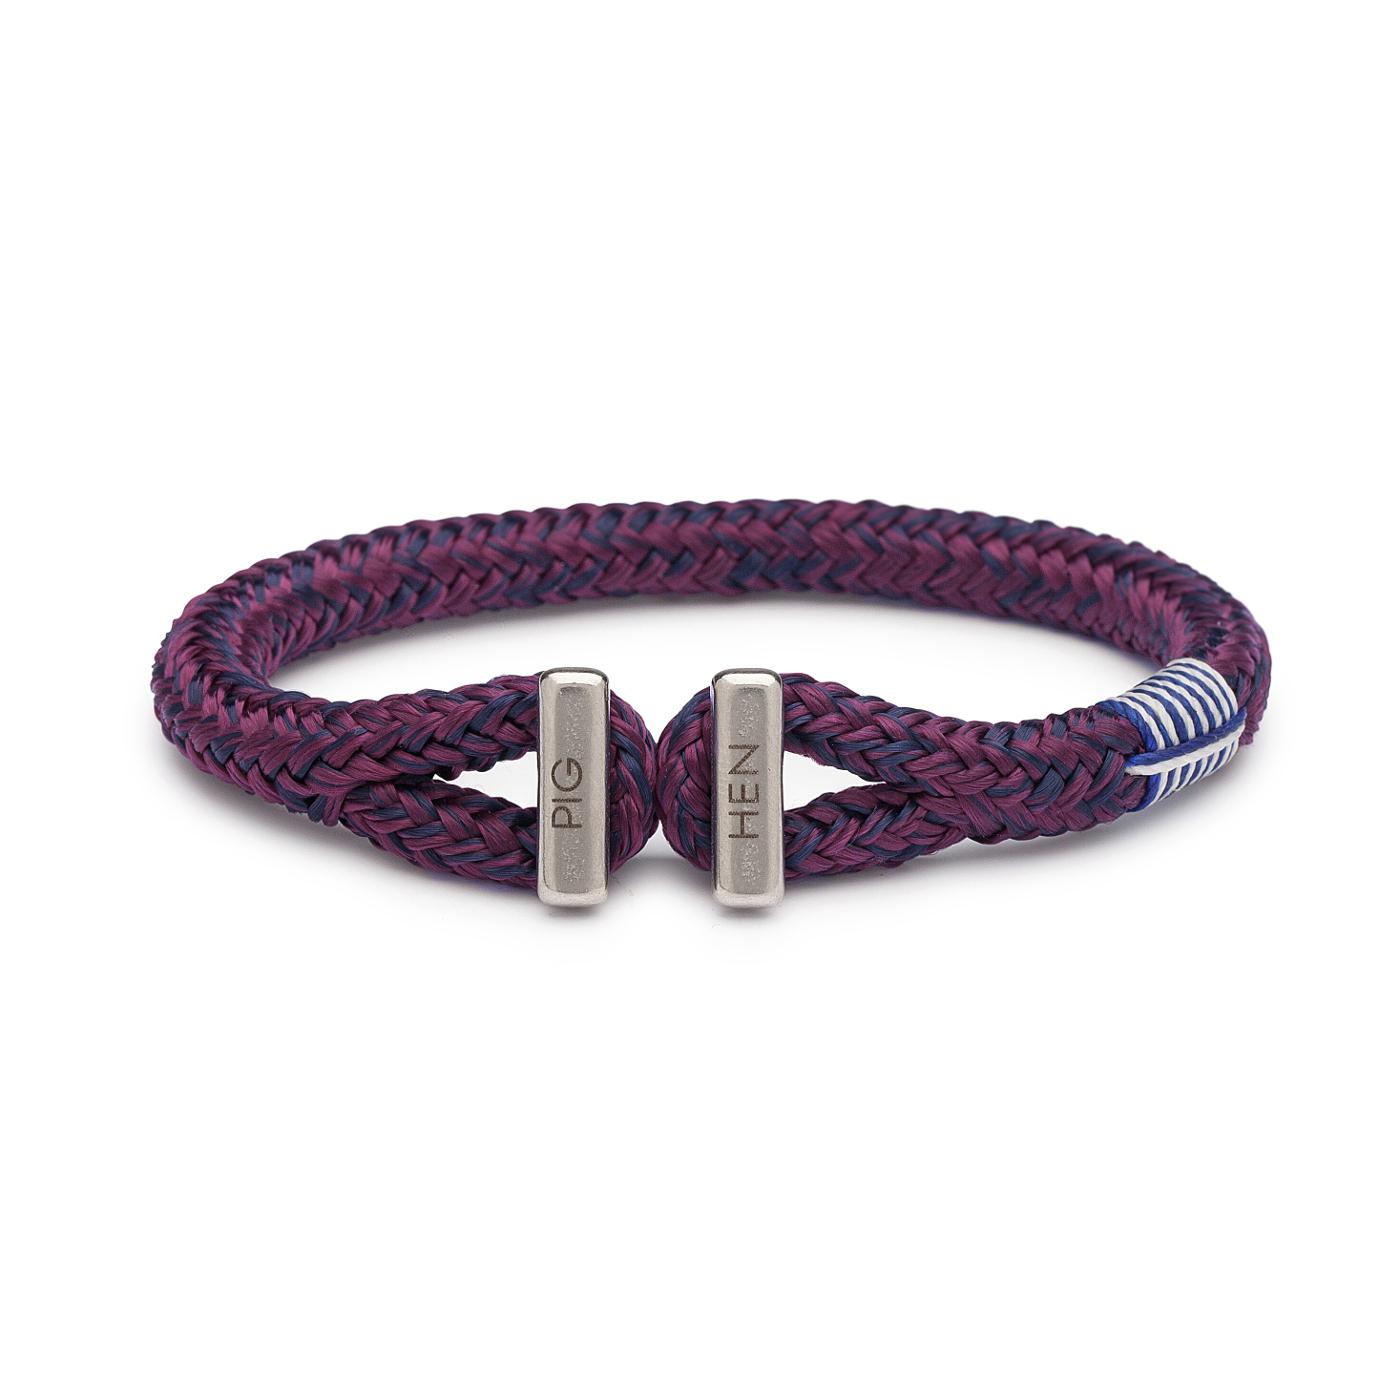 Bilde av Pig and Hen Icy Ike Bracelet P20 63000 M (Size: 18.00 cm (Maat: M))